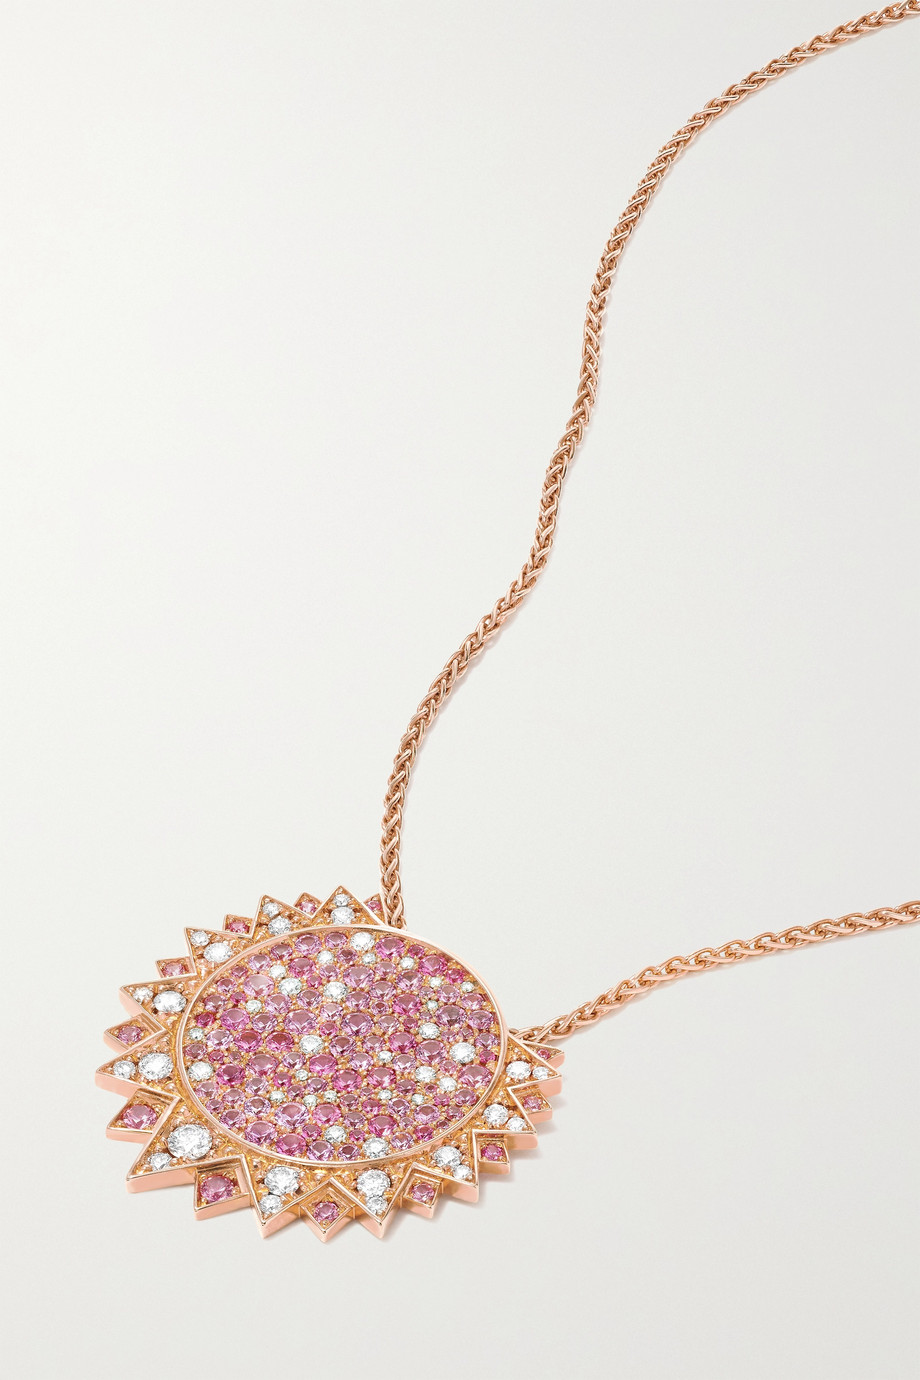 Piaget Sunlight 18-karat rose gold, sapphire and diamond necklace